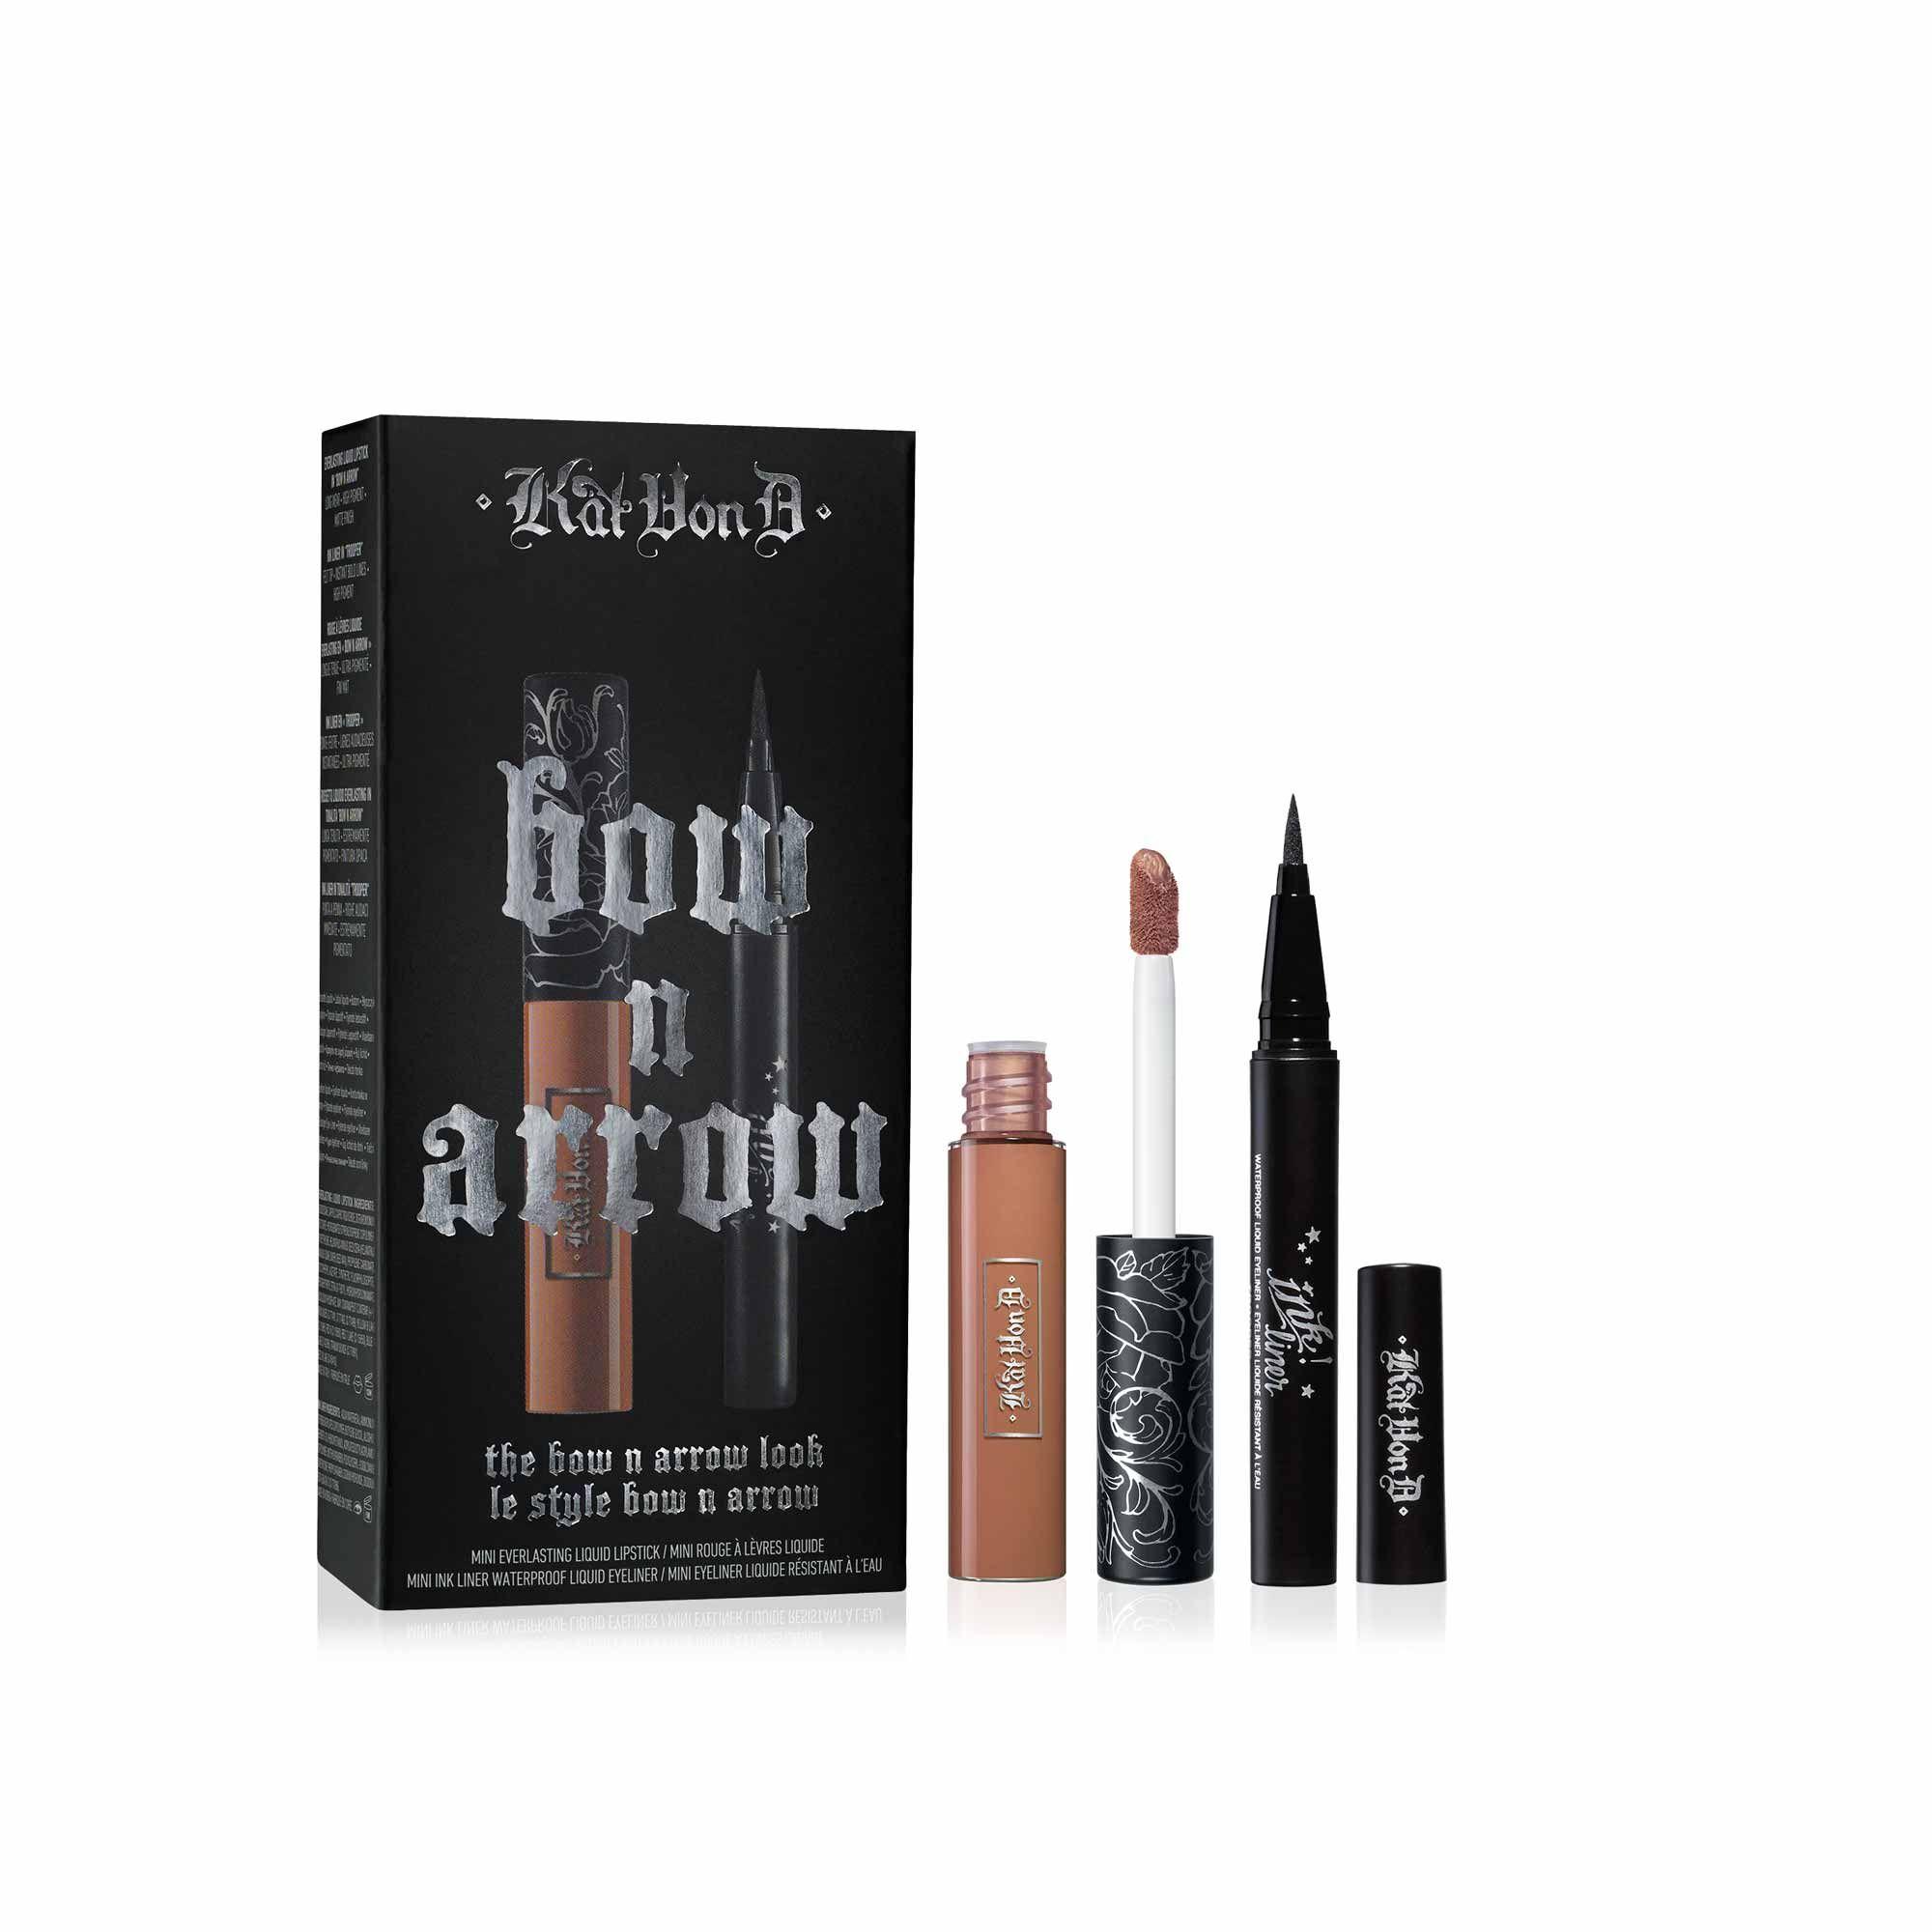 Kat Von D Beauty The Bow N Arrow Look 20 Makeup gift